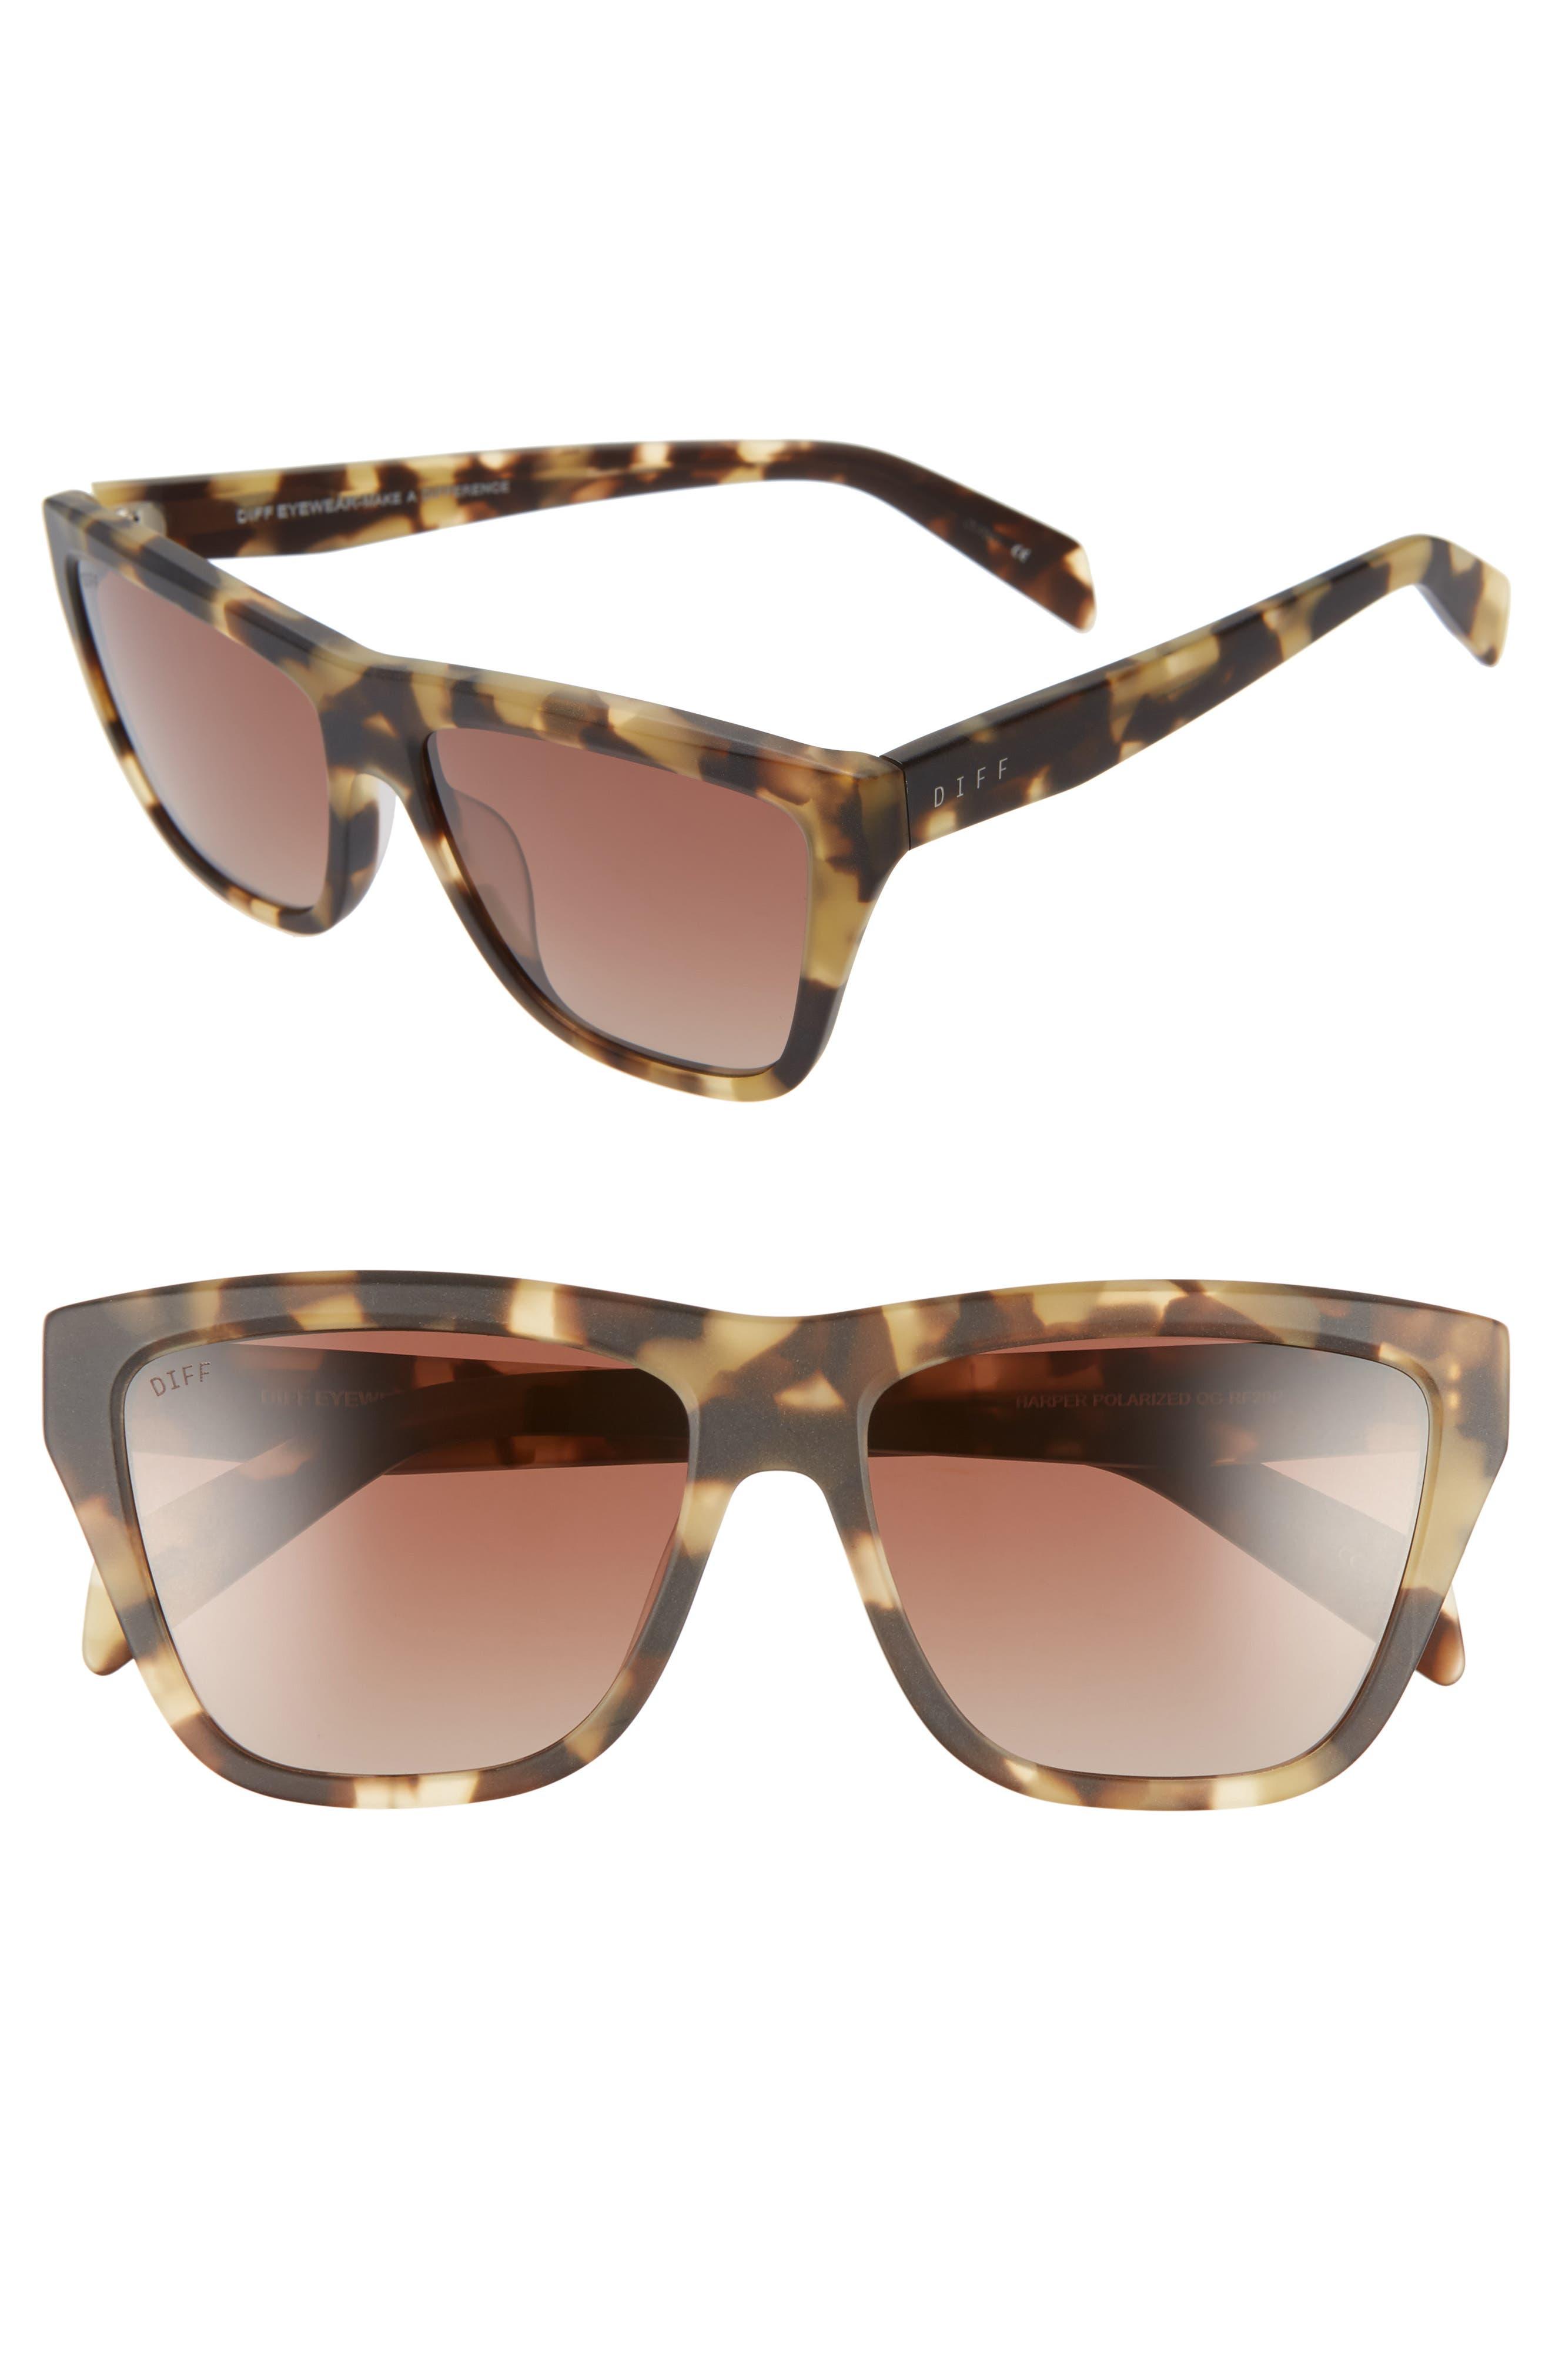 Harper 57mm Polarized Gradient Sunglasses,                             Main thumbnail 1, color,                             HAVANA/ BROWN